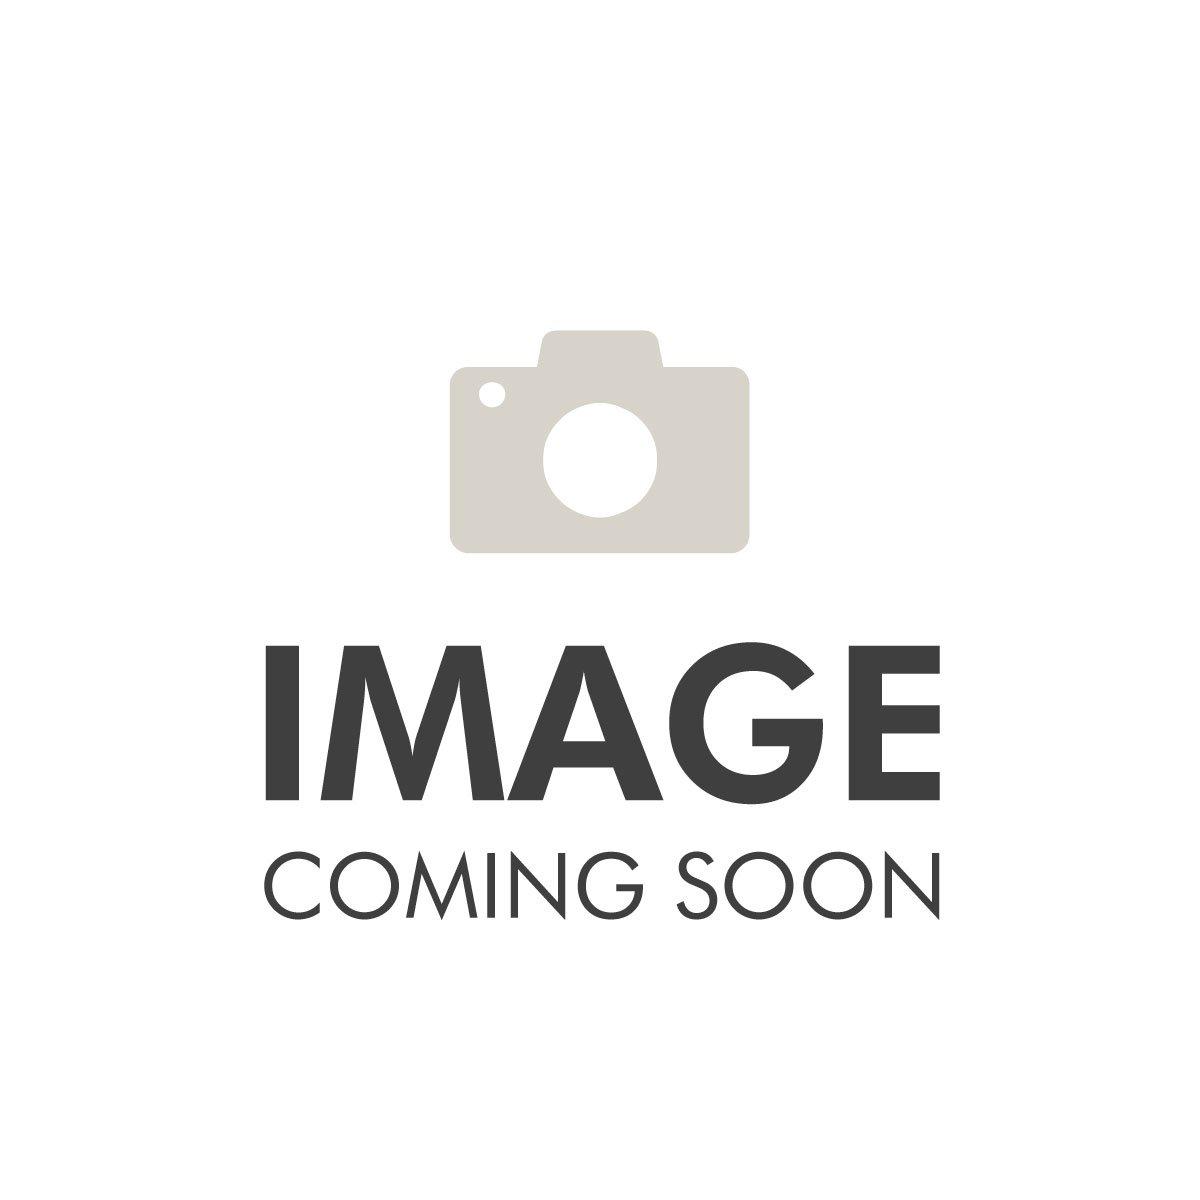 Chanel Poudre Universelle Libre Natural Finish Loose Powder 30 Naturel 30g